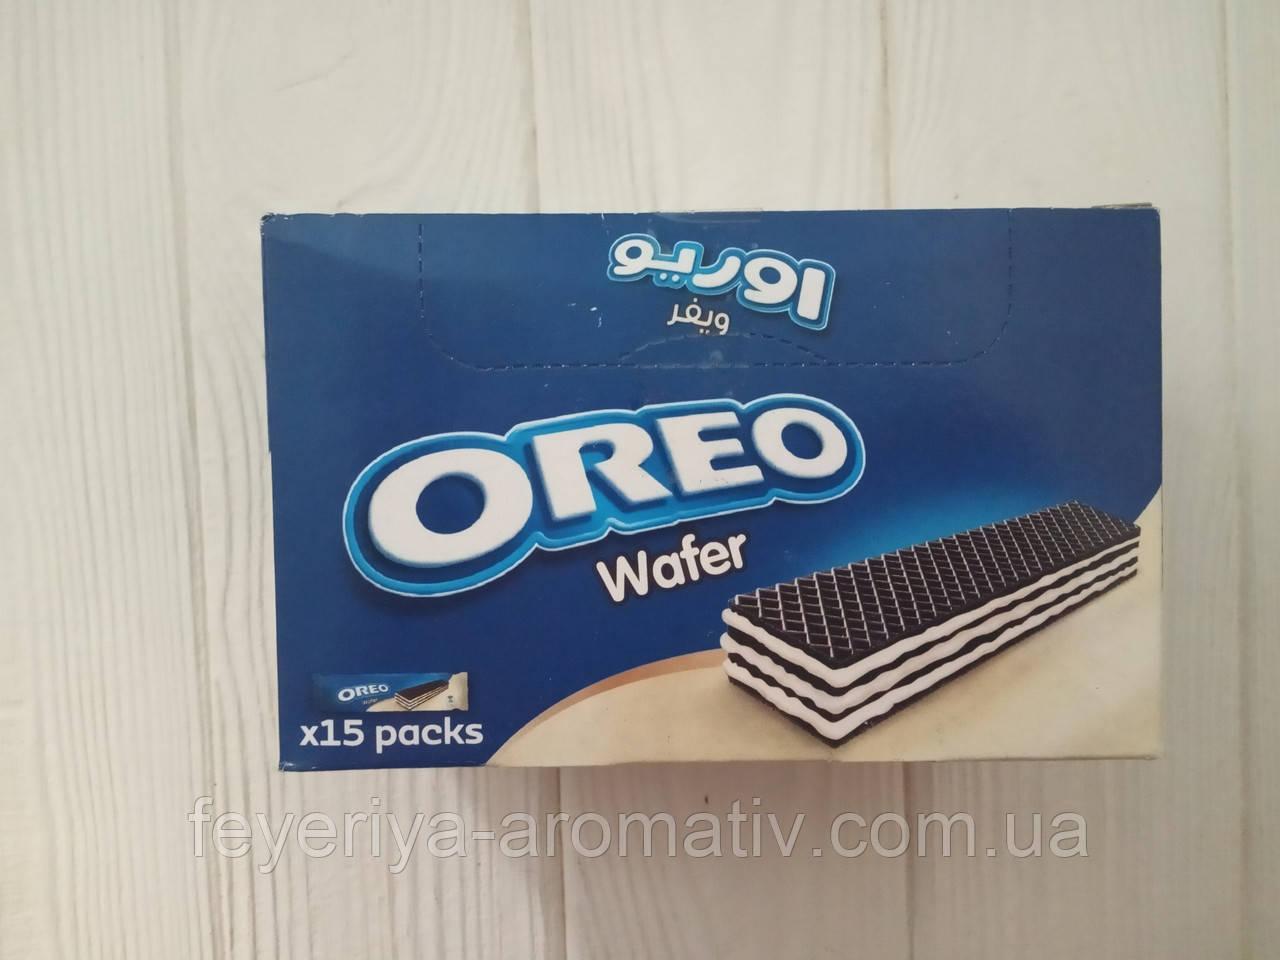 Вафли Oreo 15шт 213 g (15x14.2g)